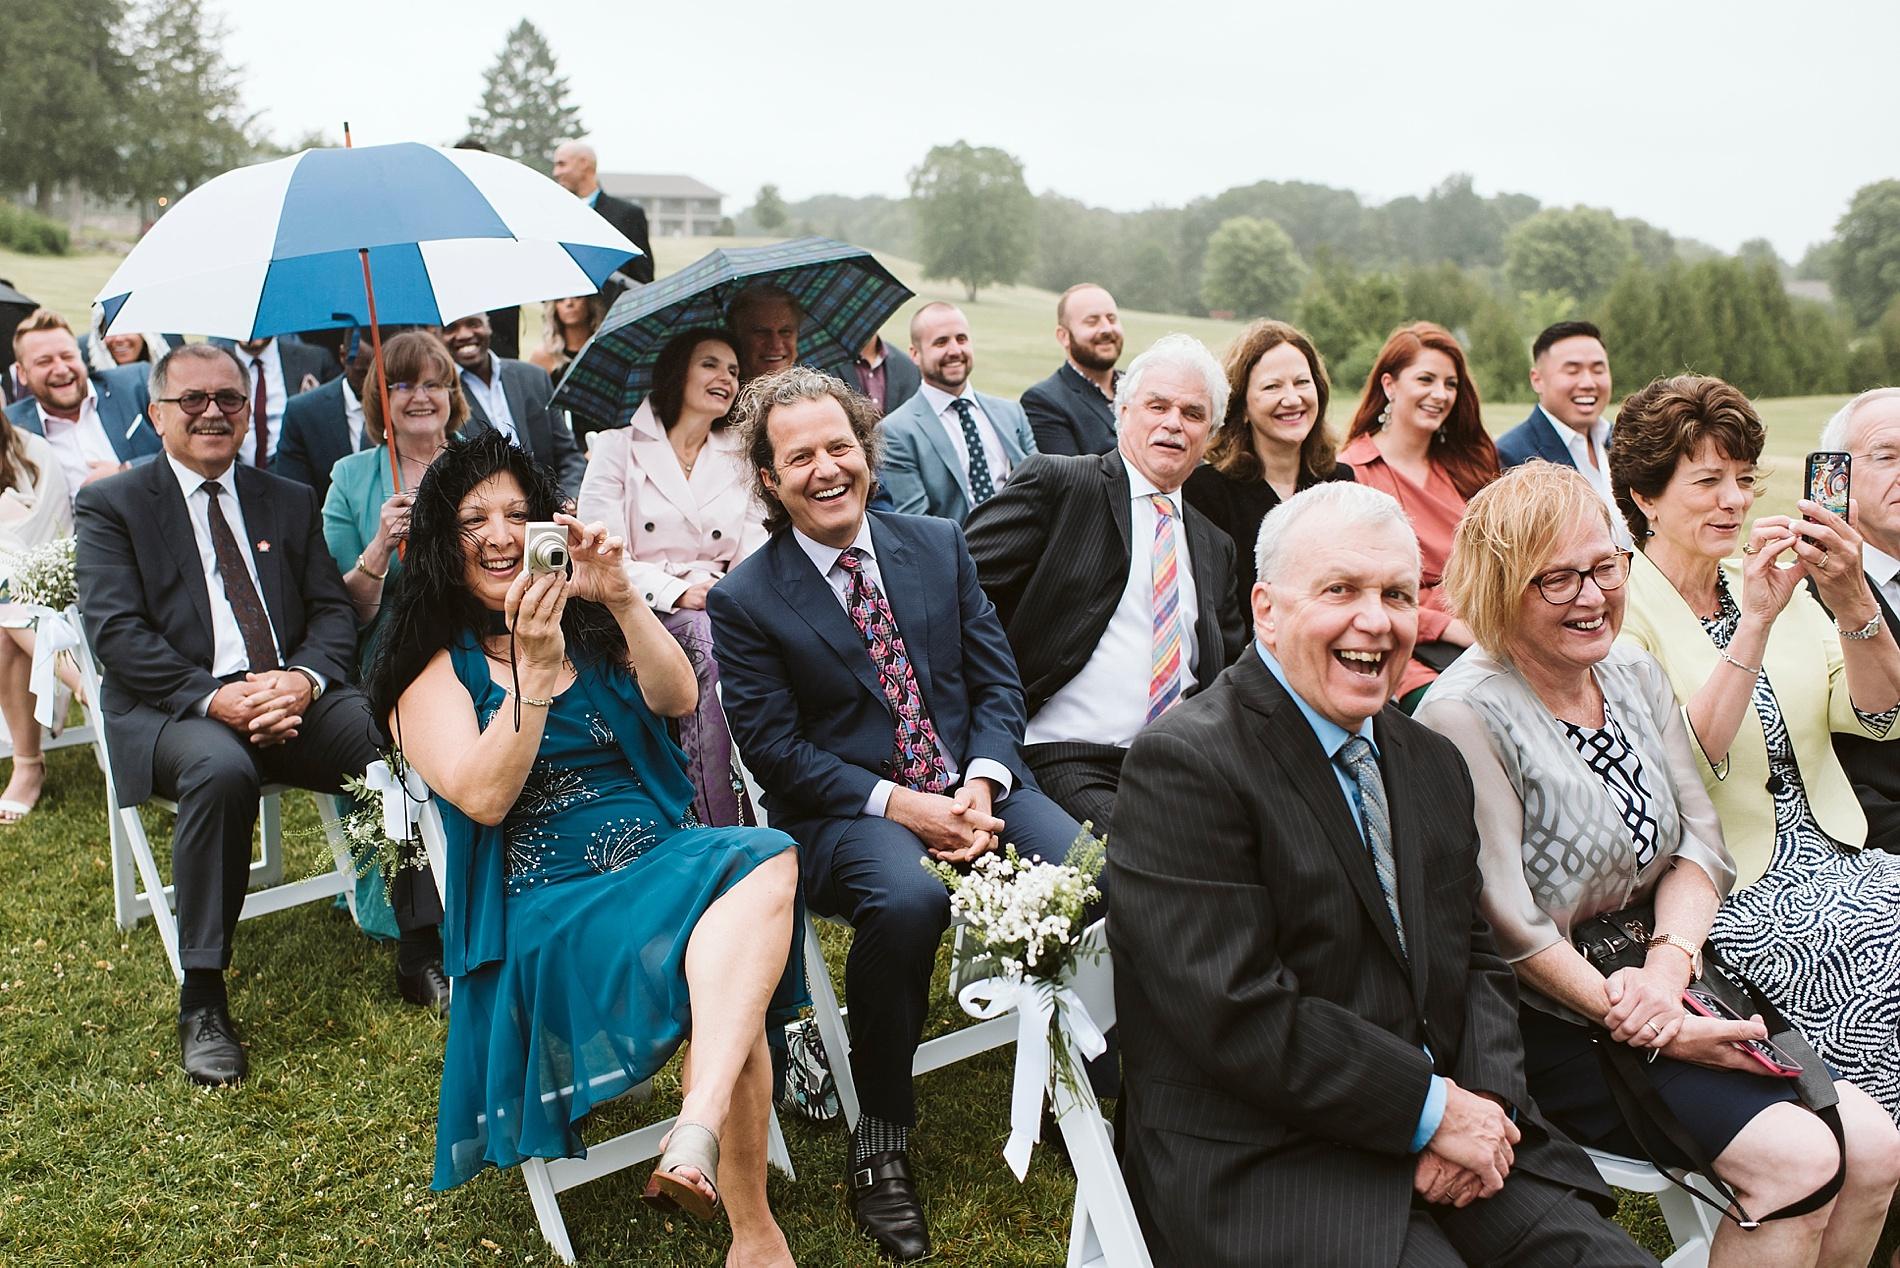 Kawartha_Lakes_Wedding_Bobcageon_Eganridge_Resort_Toronto_Photographer_0037.jpg